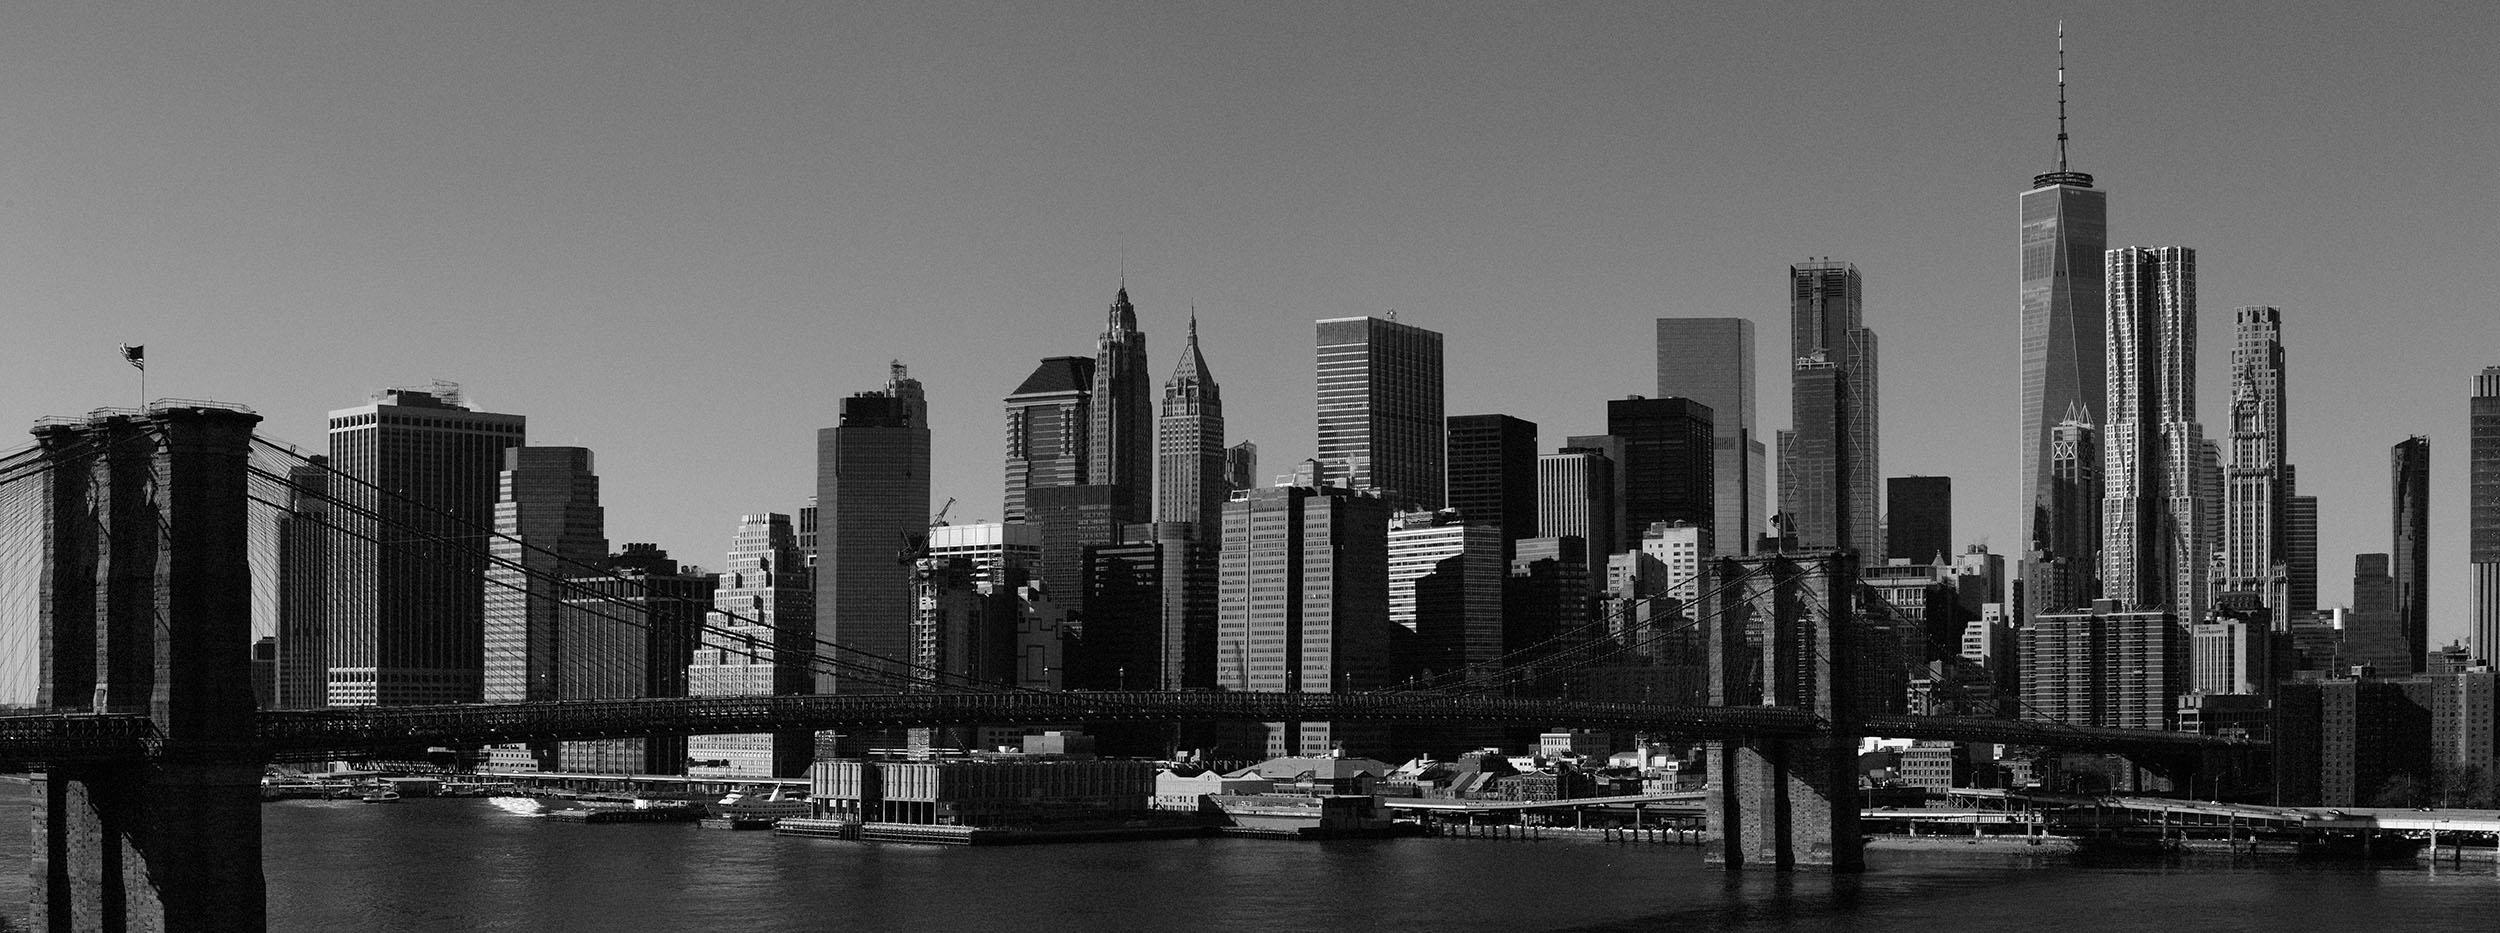 New York Skyline - Fine Art Photography Print